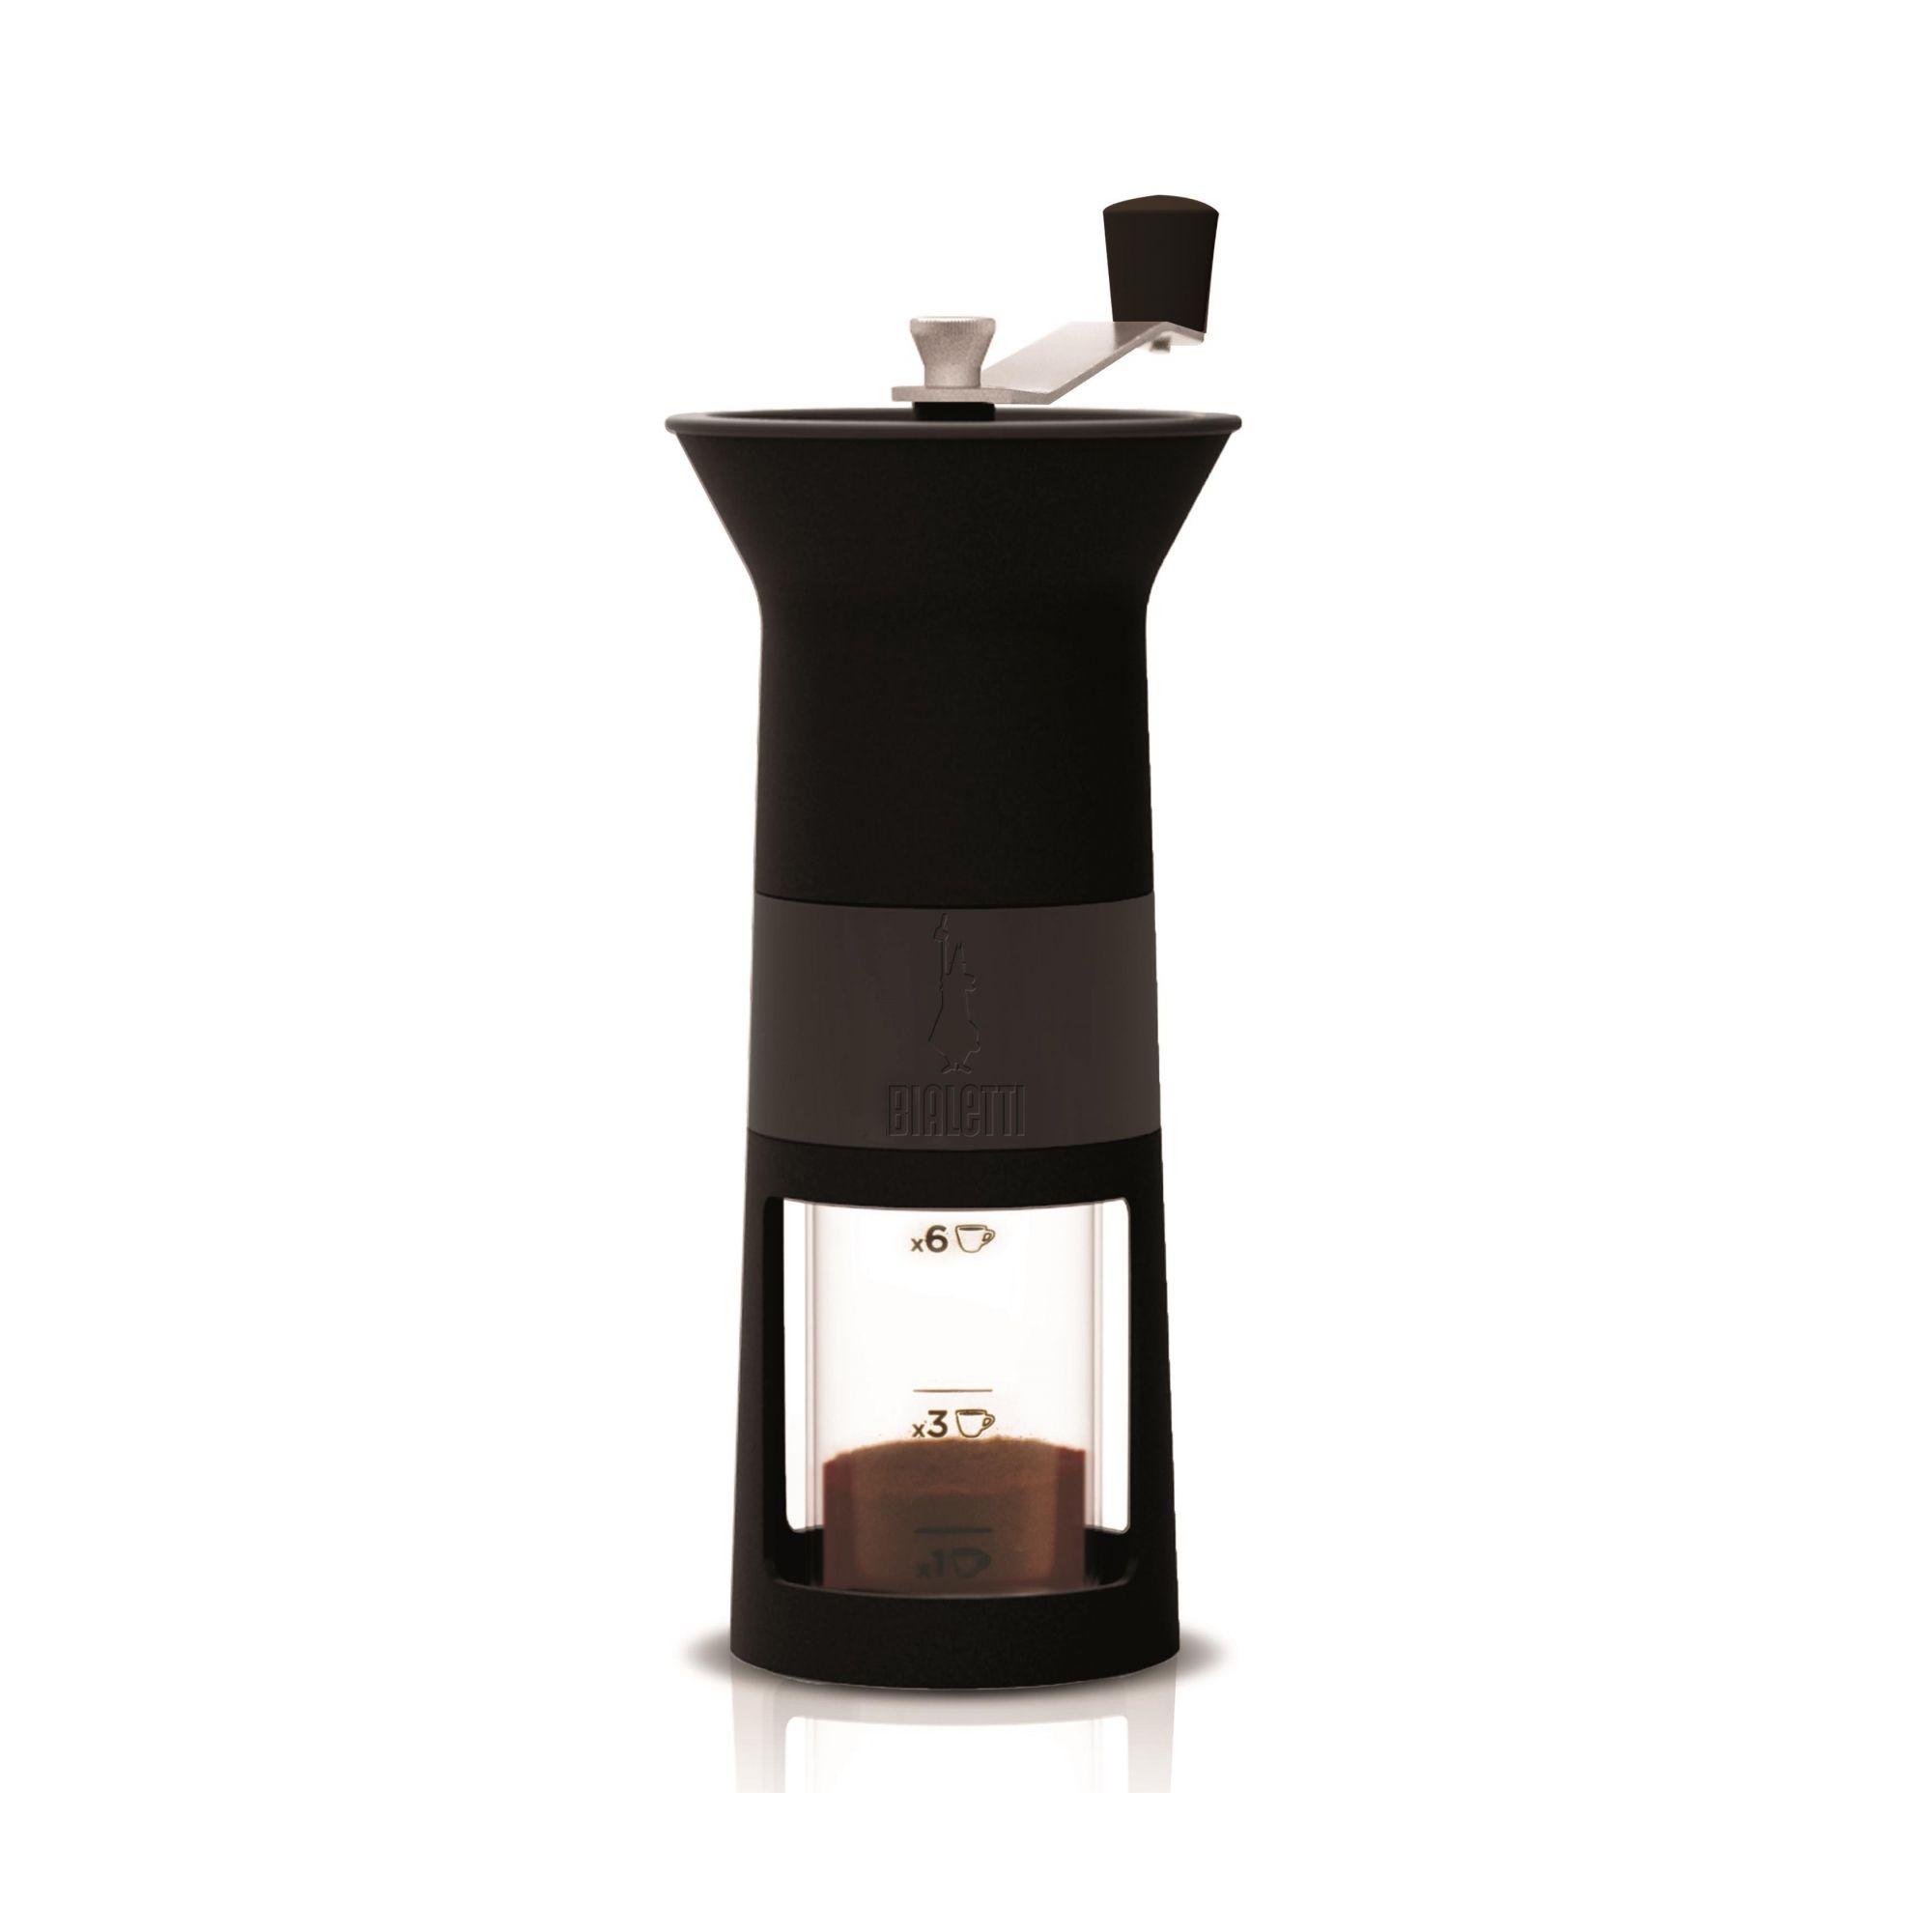 Moedor de Café Manual Bialetti Preto